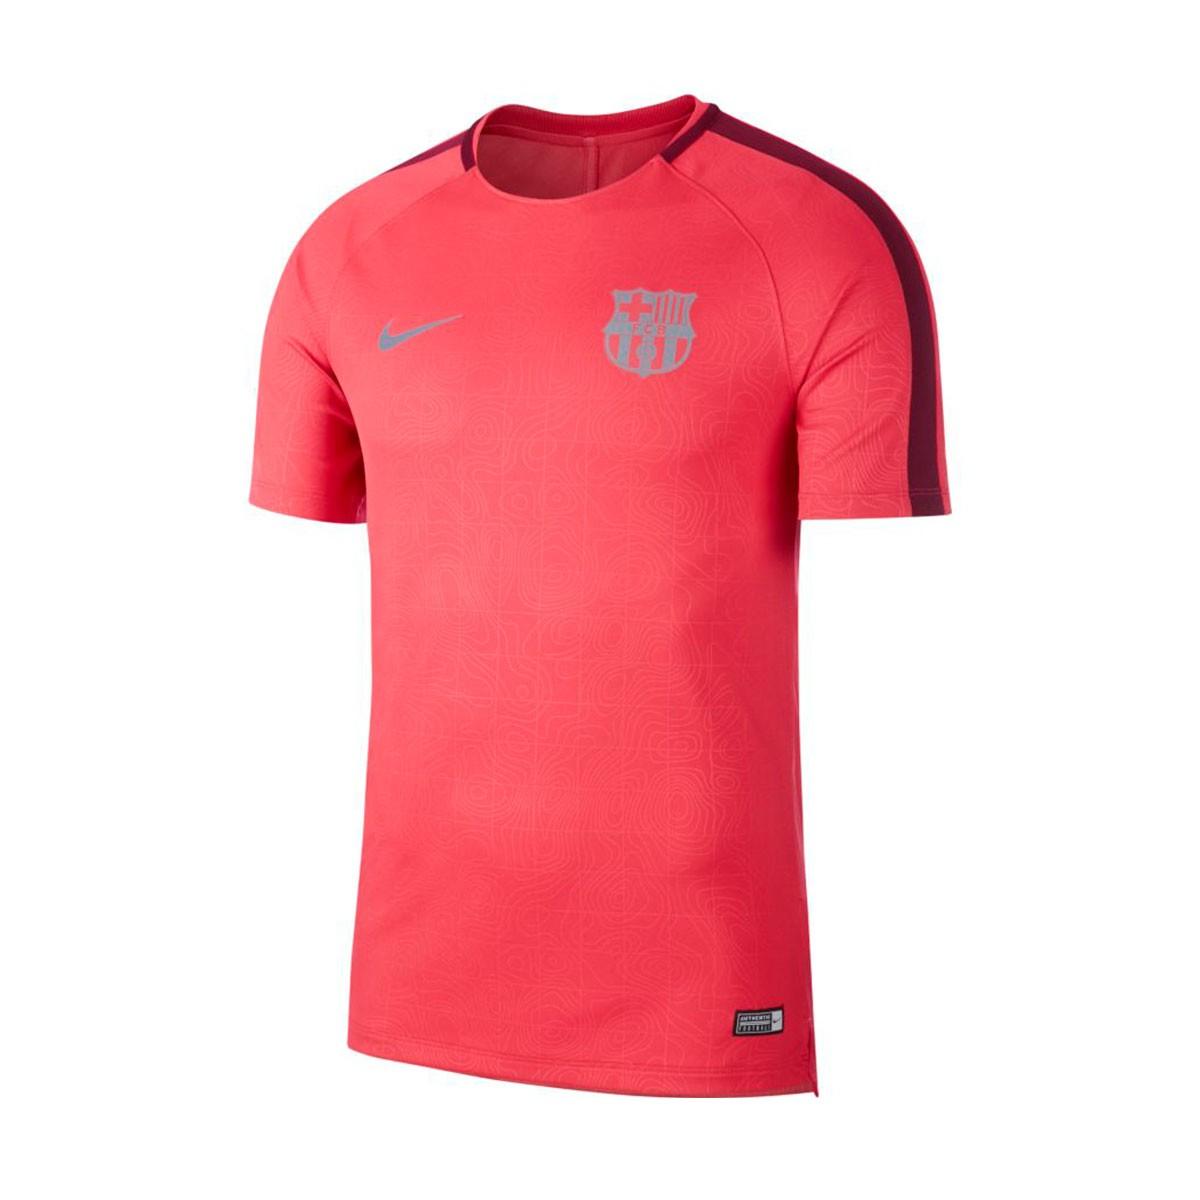 c52fa3df3 Jersey Nike Dry FC Barcelona Squad 2018-2019 Tropical pink-Deep ...